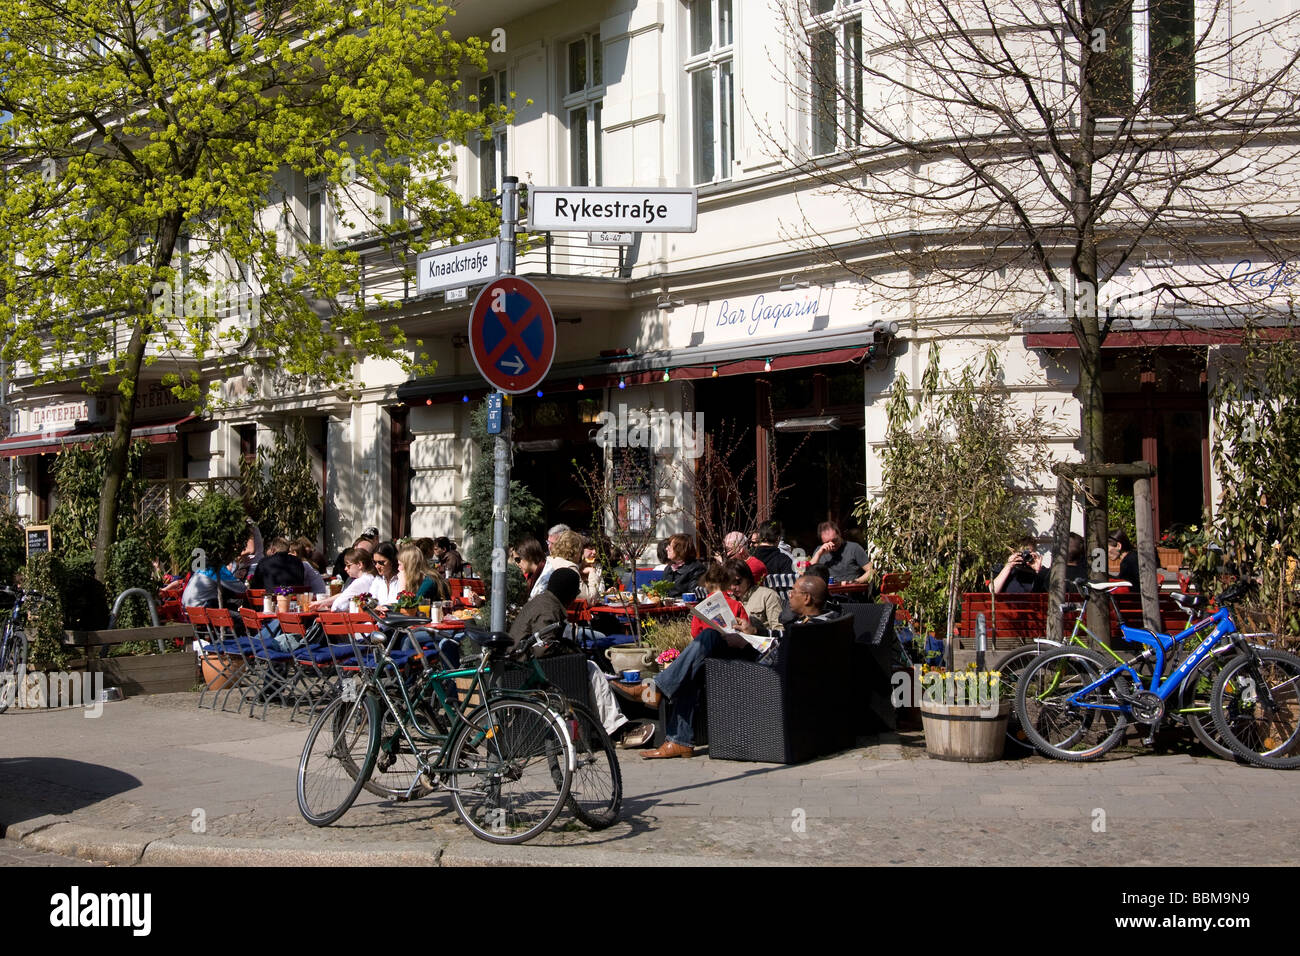 bar gagarin caf on kollwitzplatz square prenzlauer berg pankow stock photo royalty free. Black Bedroom Furniture Sets. Home Design Ideas